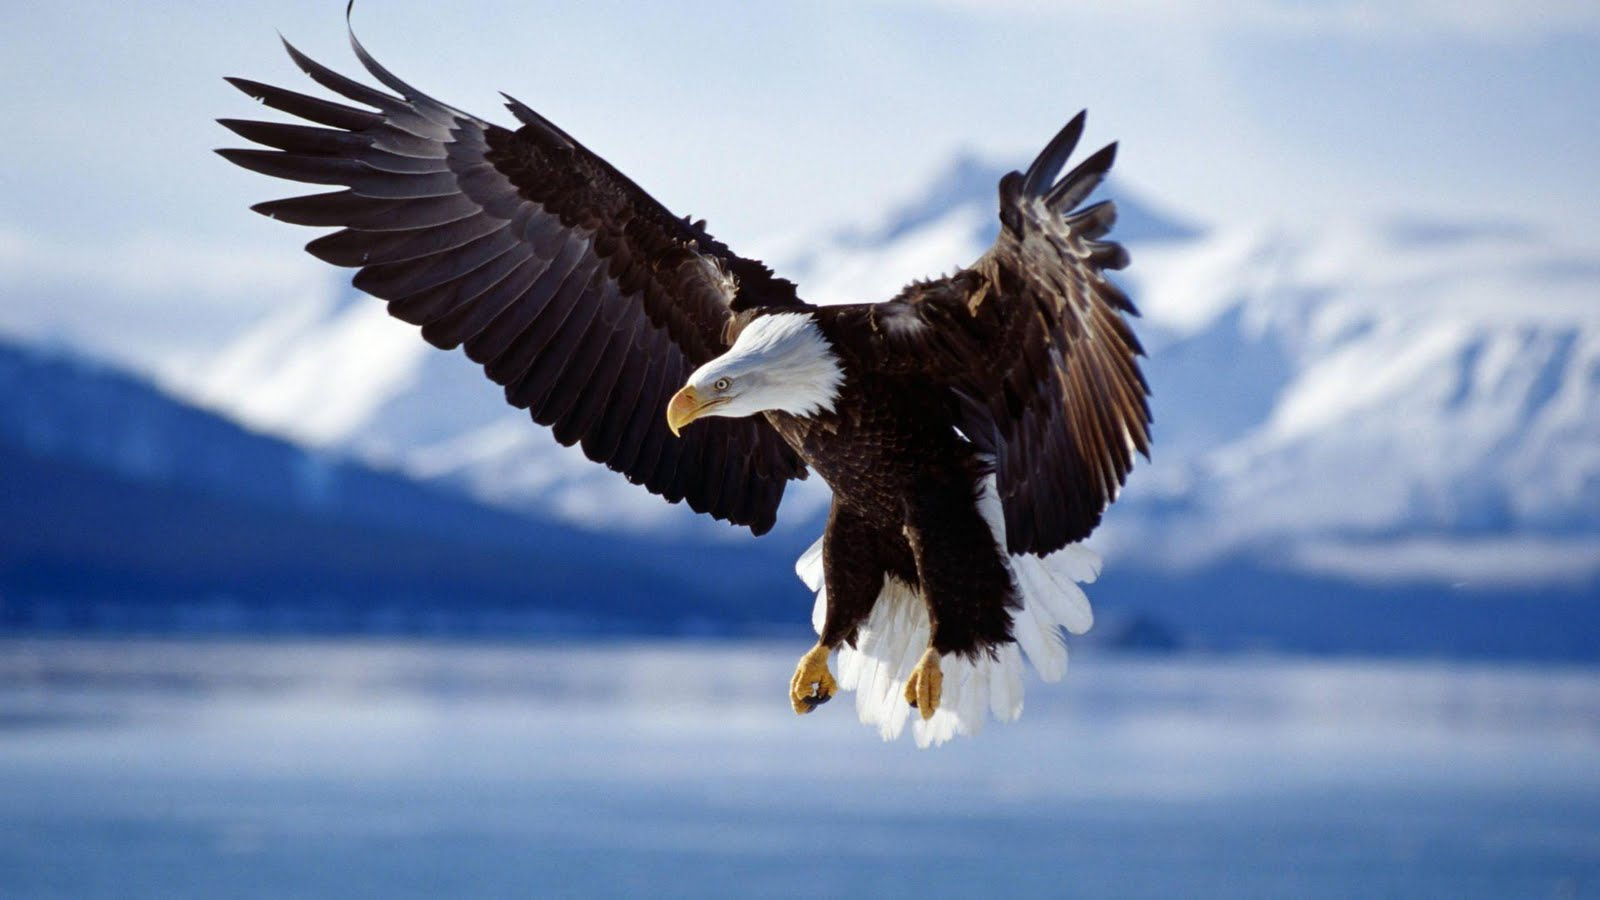 Must see Wallpaper Horse Eagle - wallpaper_eagle  Photograph_18522.jpg